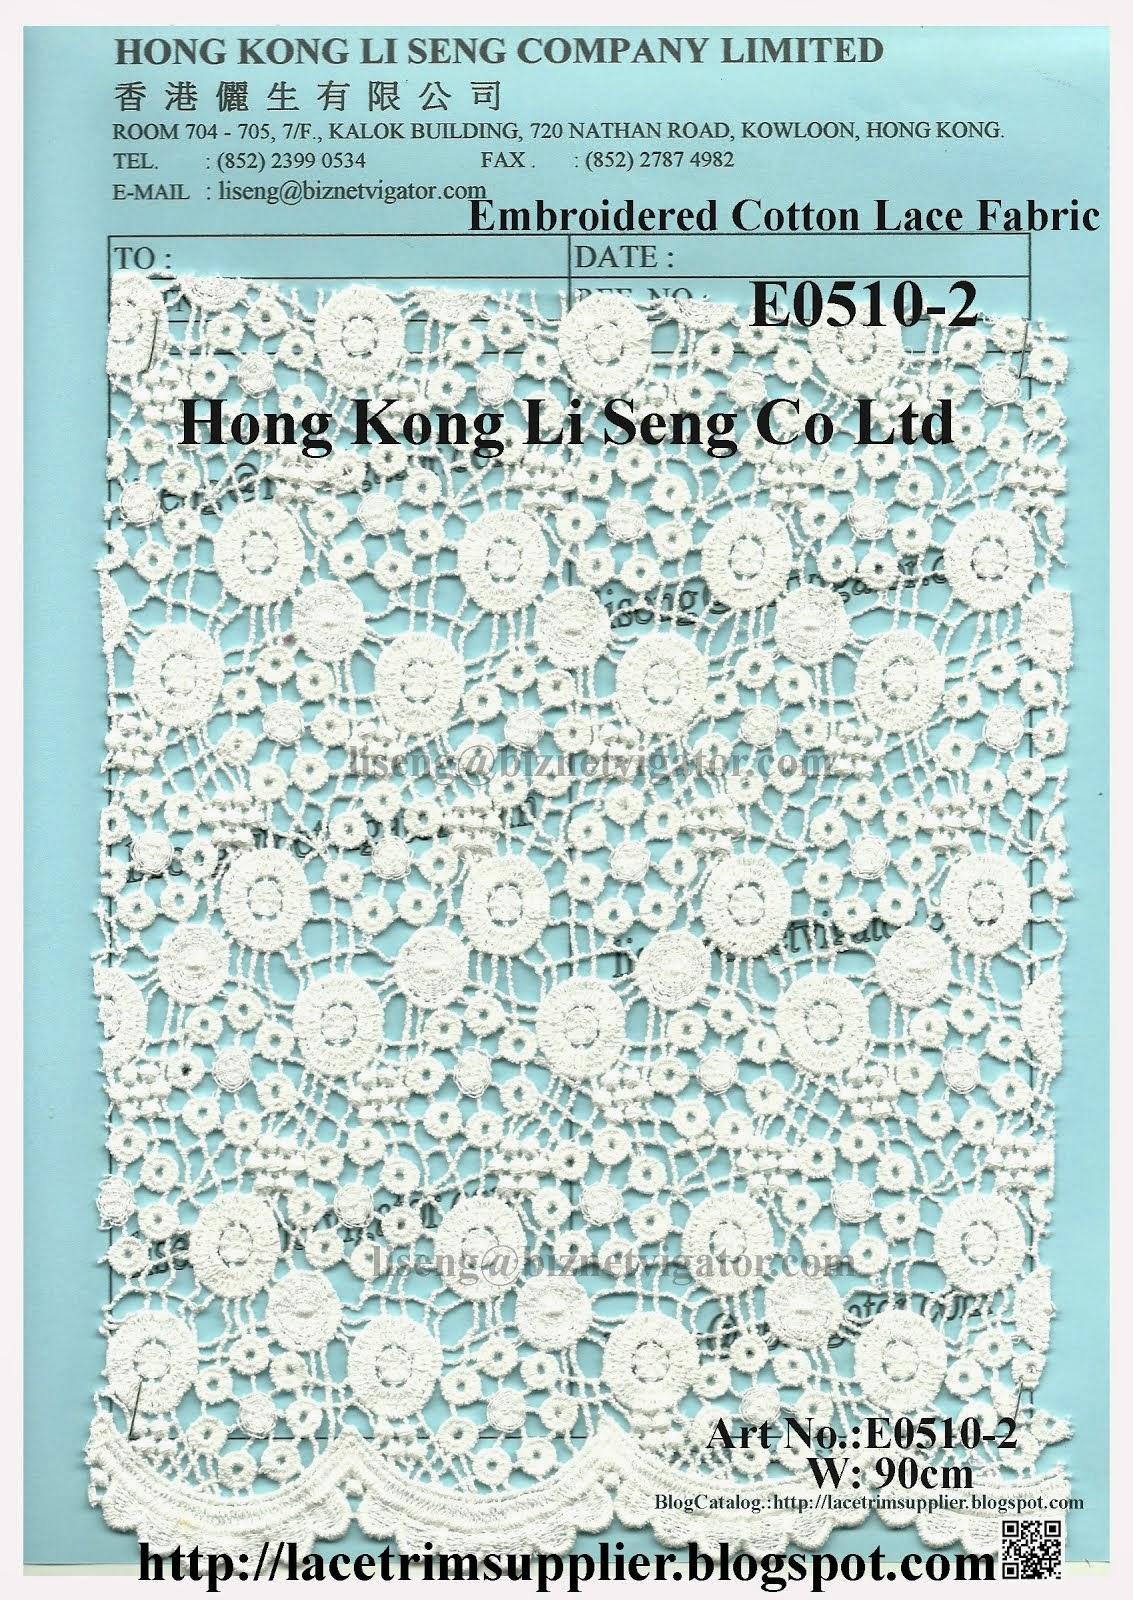 2014 - New Lace Fabric Pattern Shown On - Hong Kong Li Seng Co Ltd